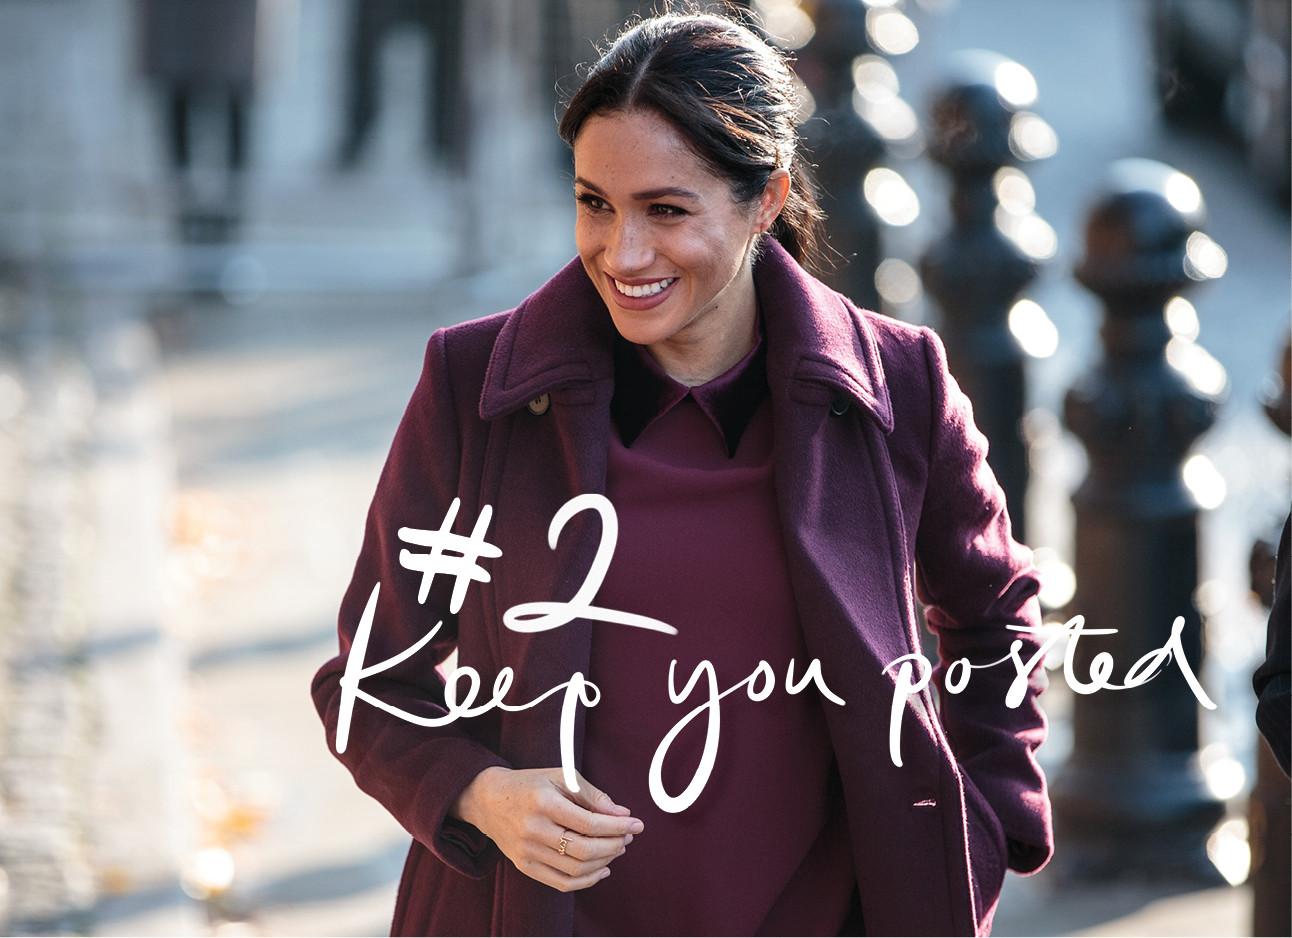 Meghan Markle lachend met bordeaux jas en jurk op straat